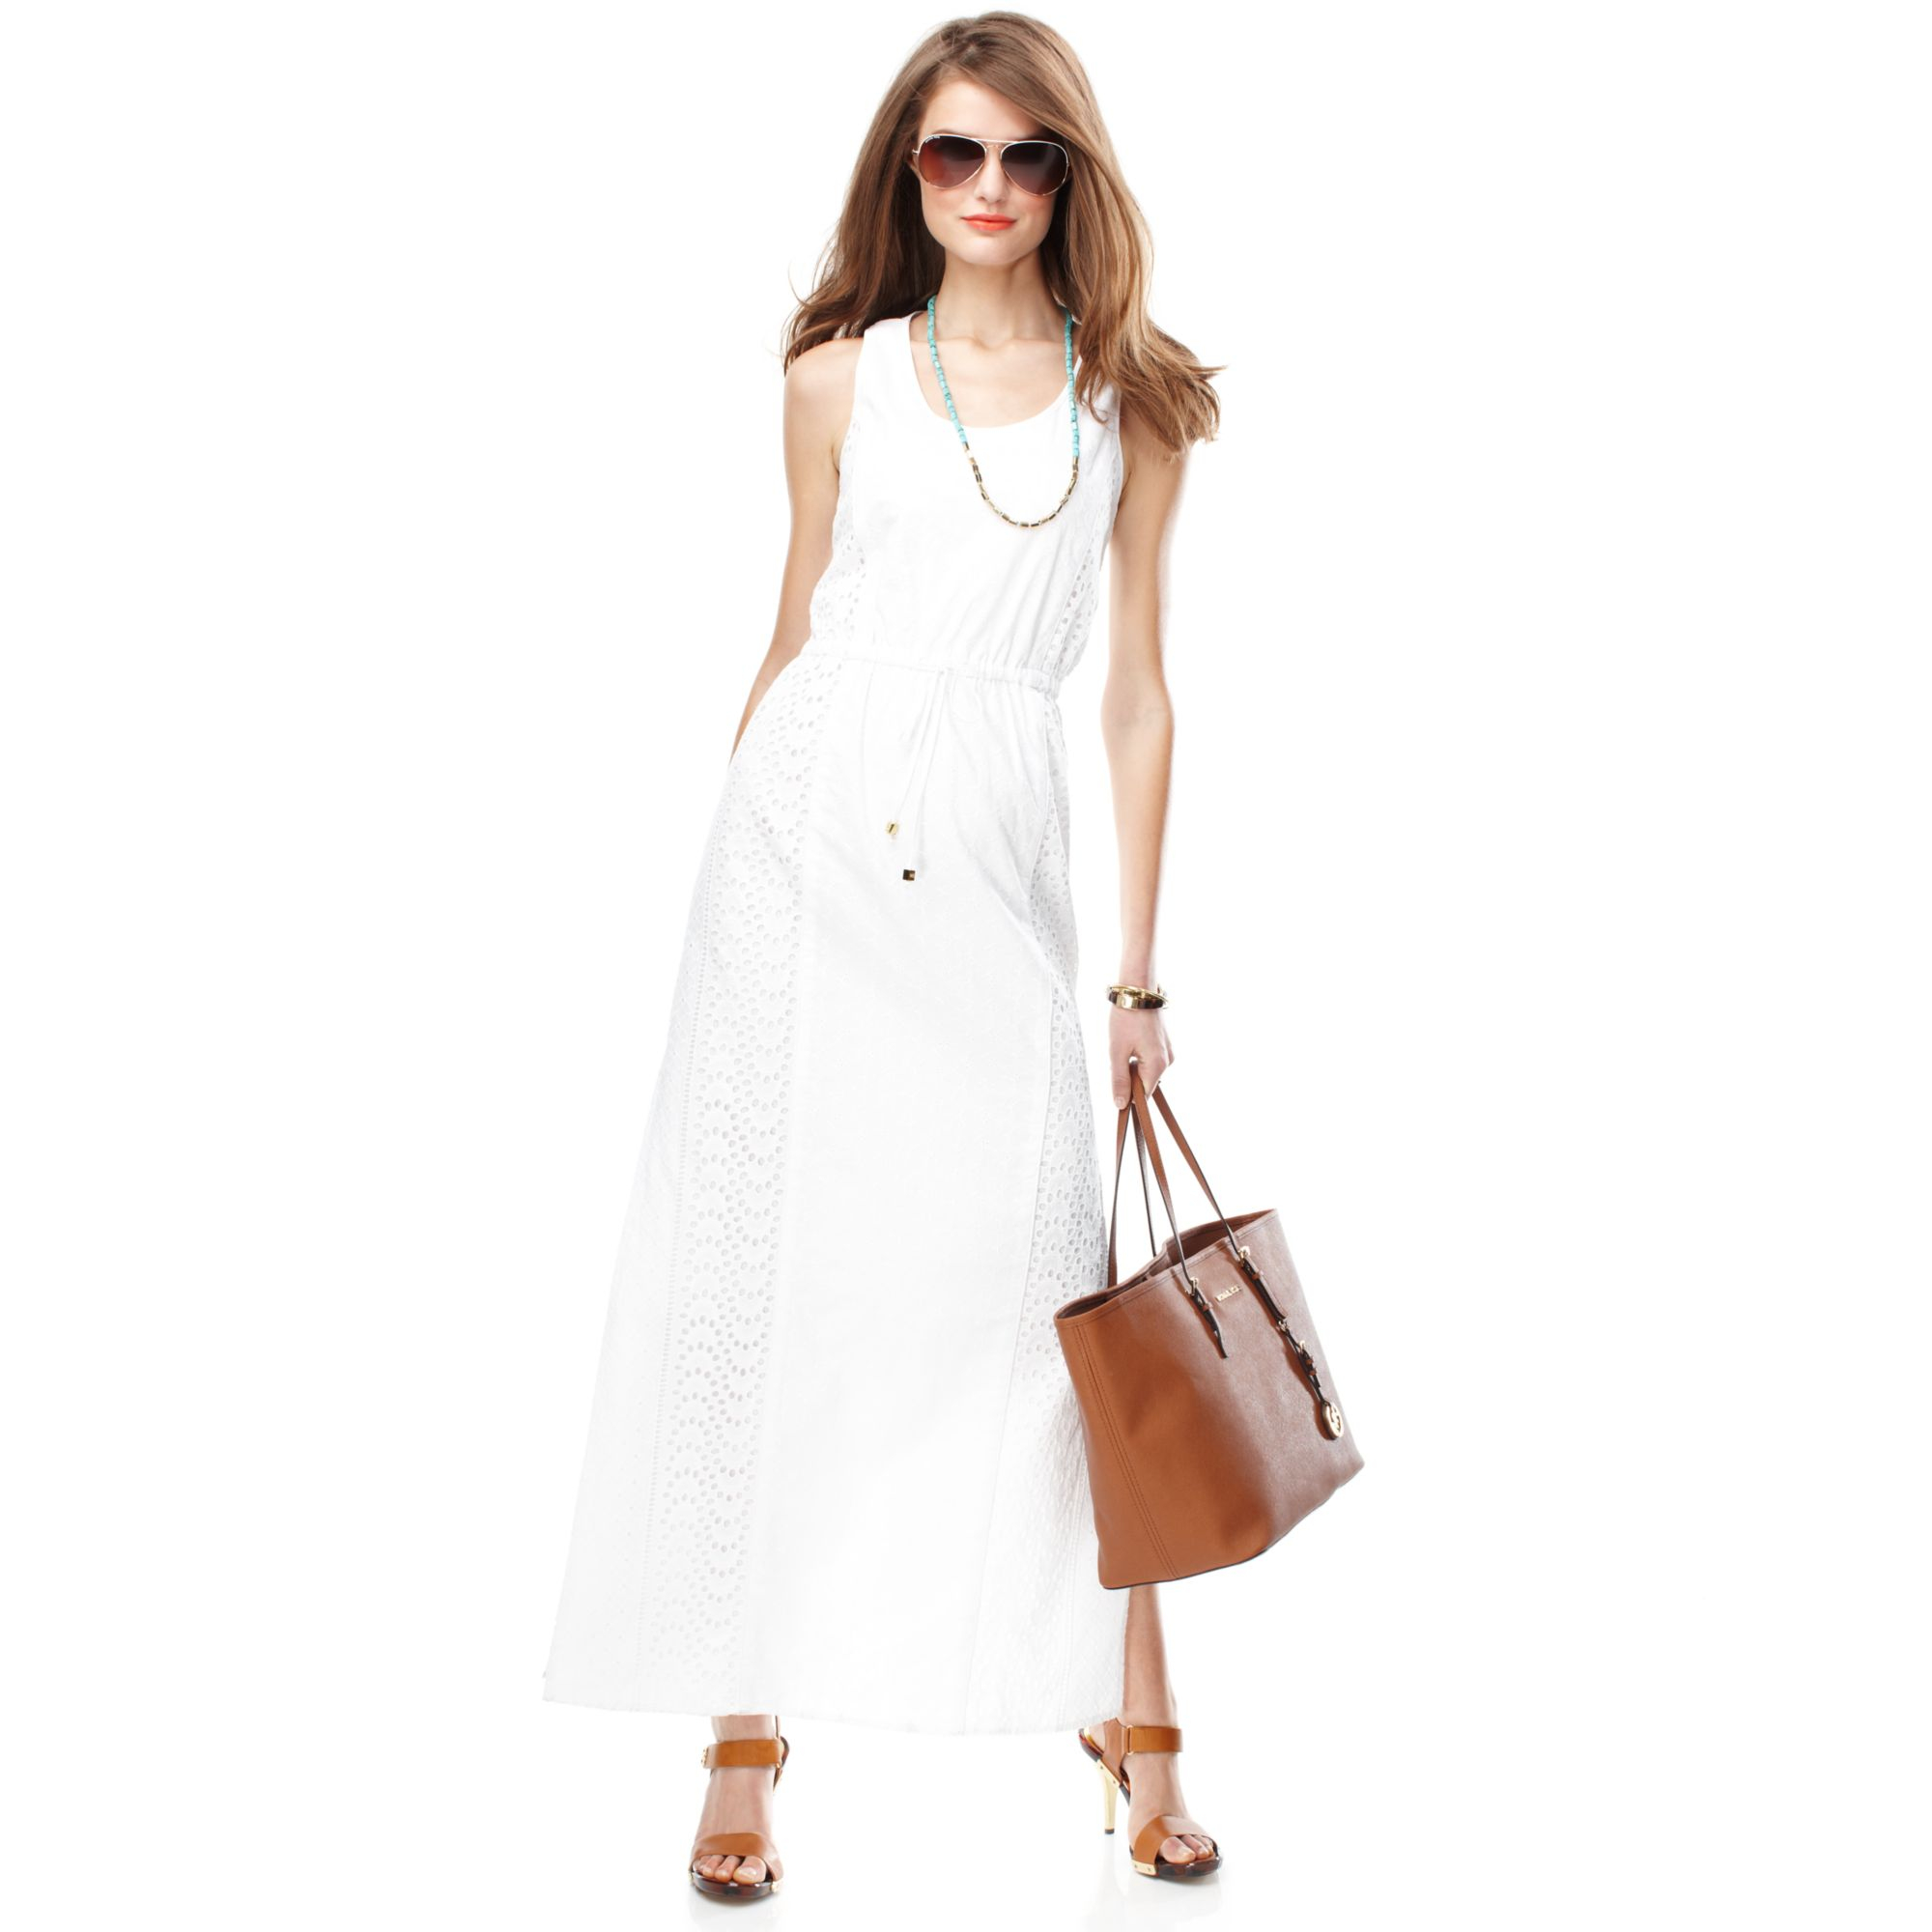 587997ad7d3 Lyst - Michael Kors Michael Sleeveless Cotton Eyelet Maxi Dress in White